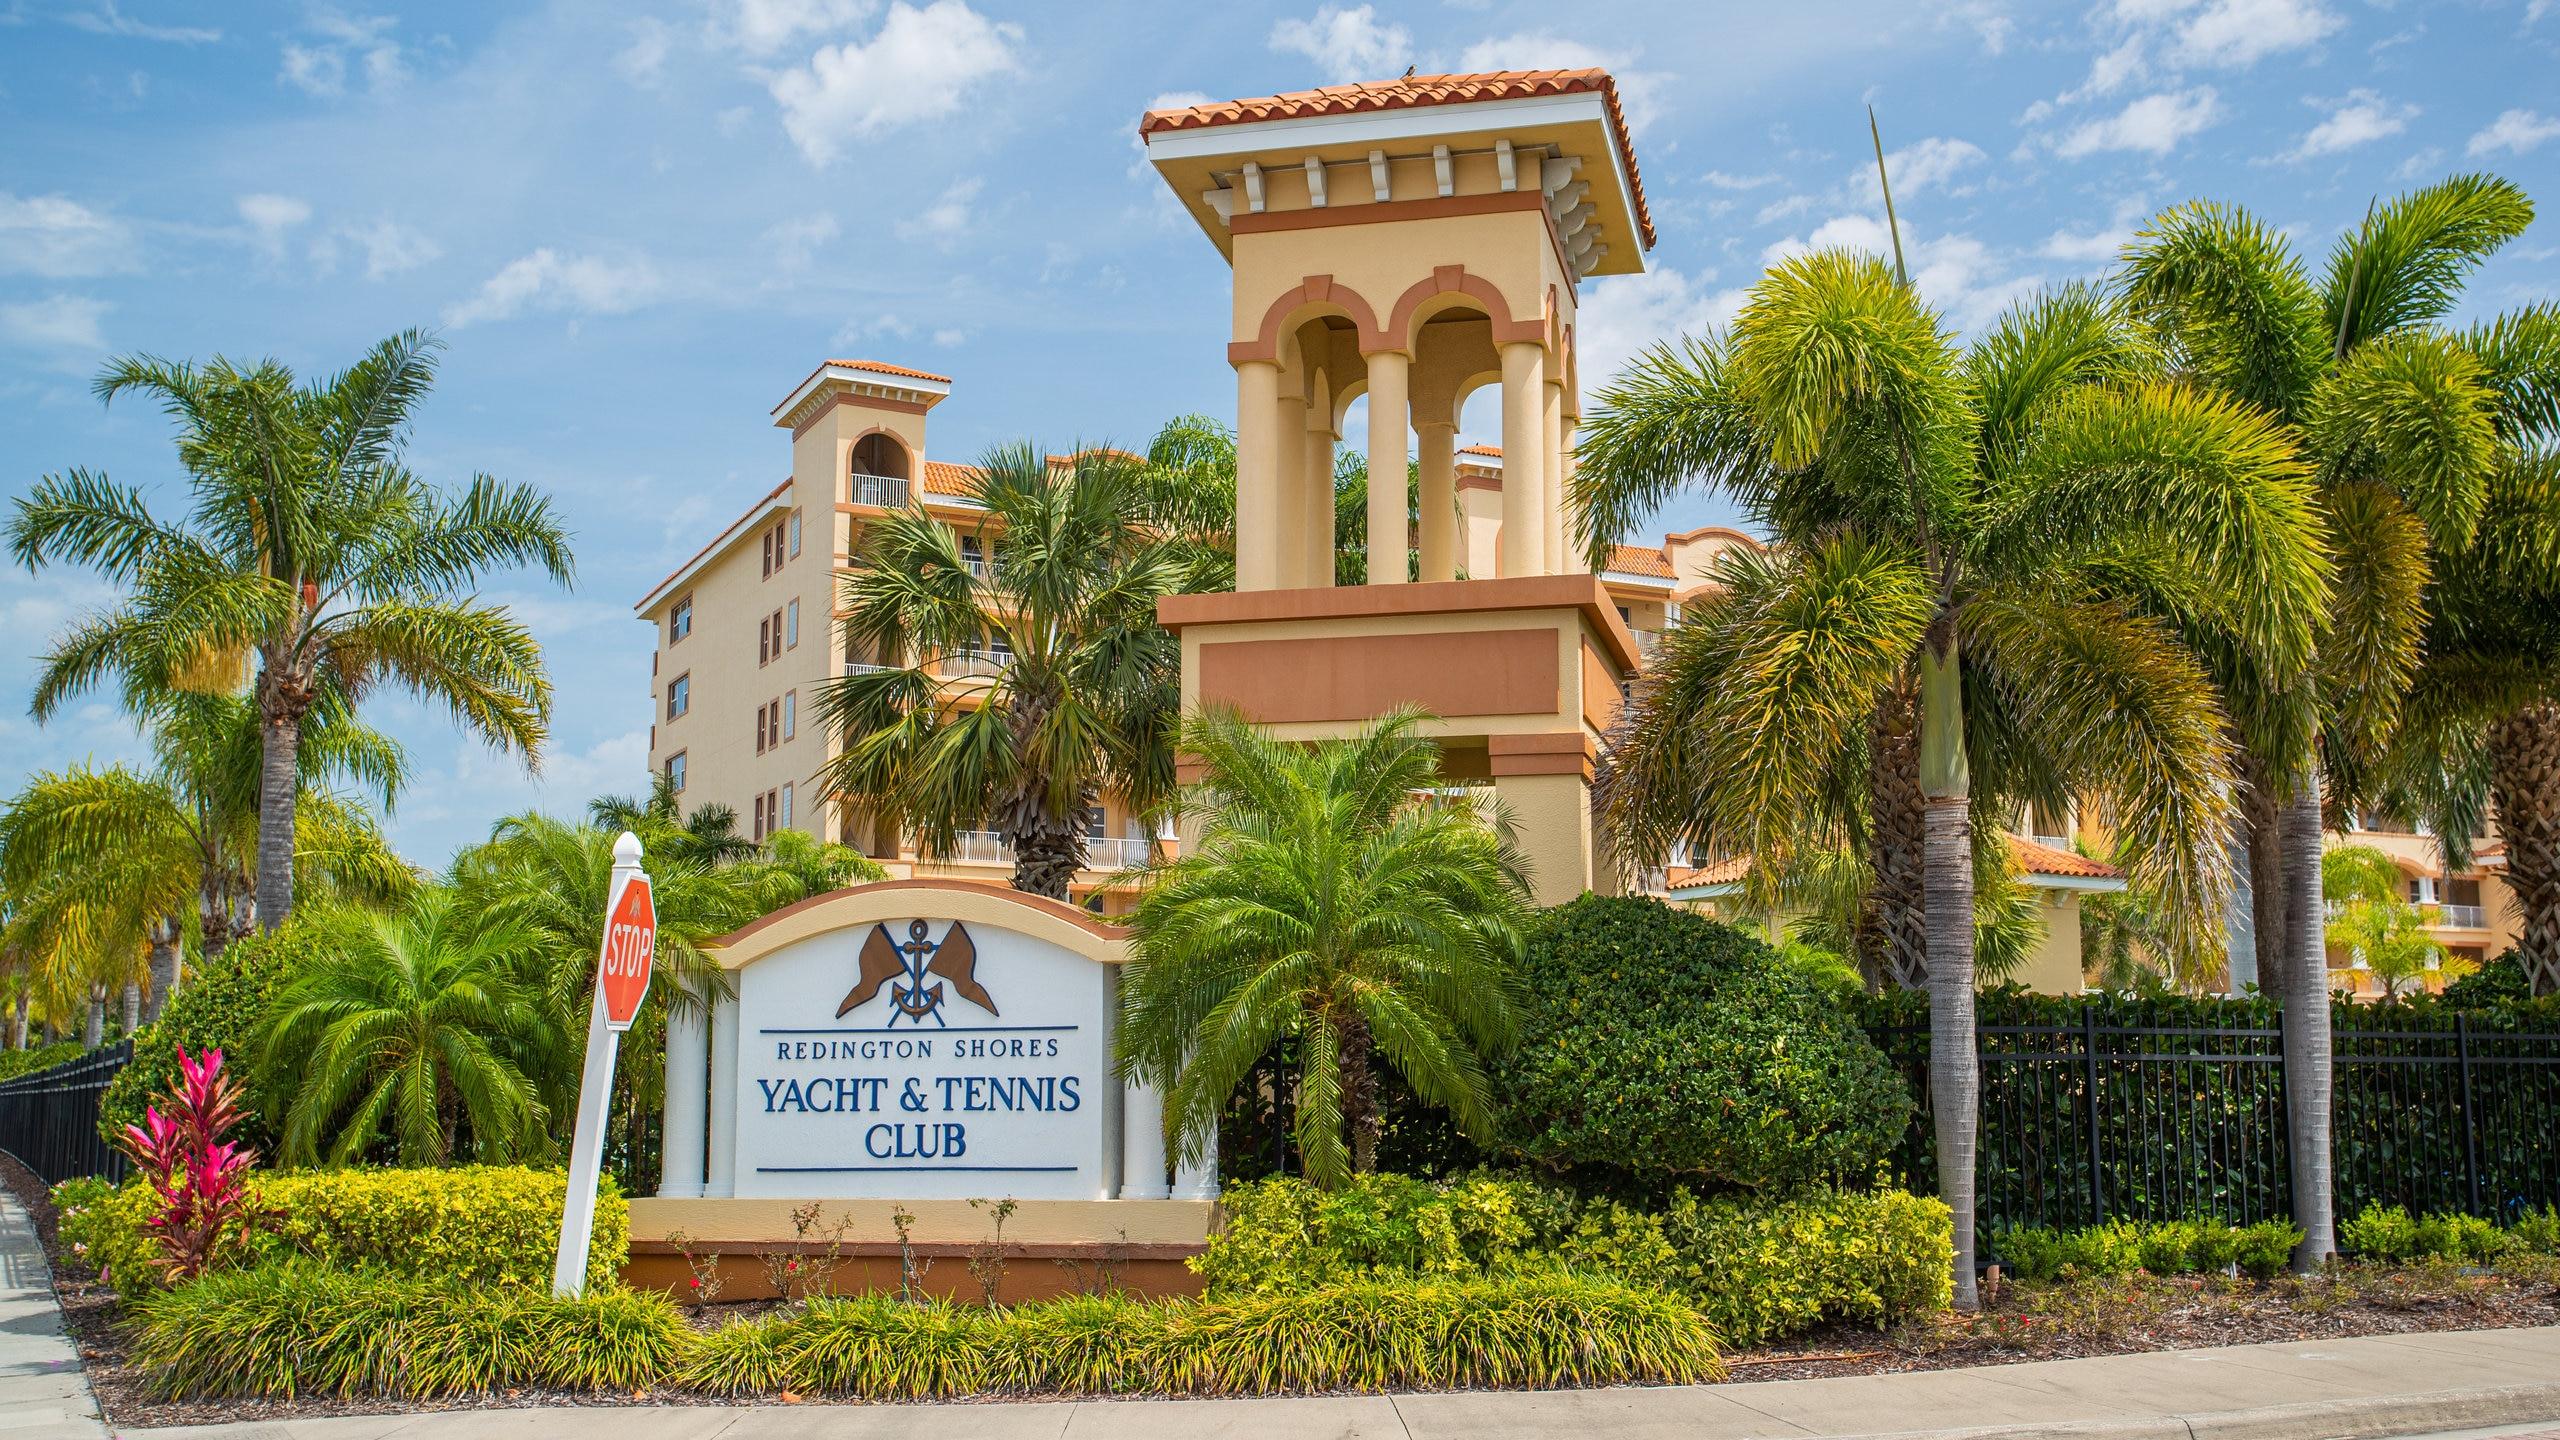 Redington Shores, Florida, United States of America